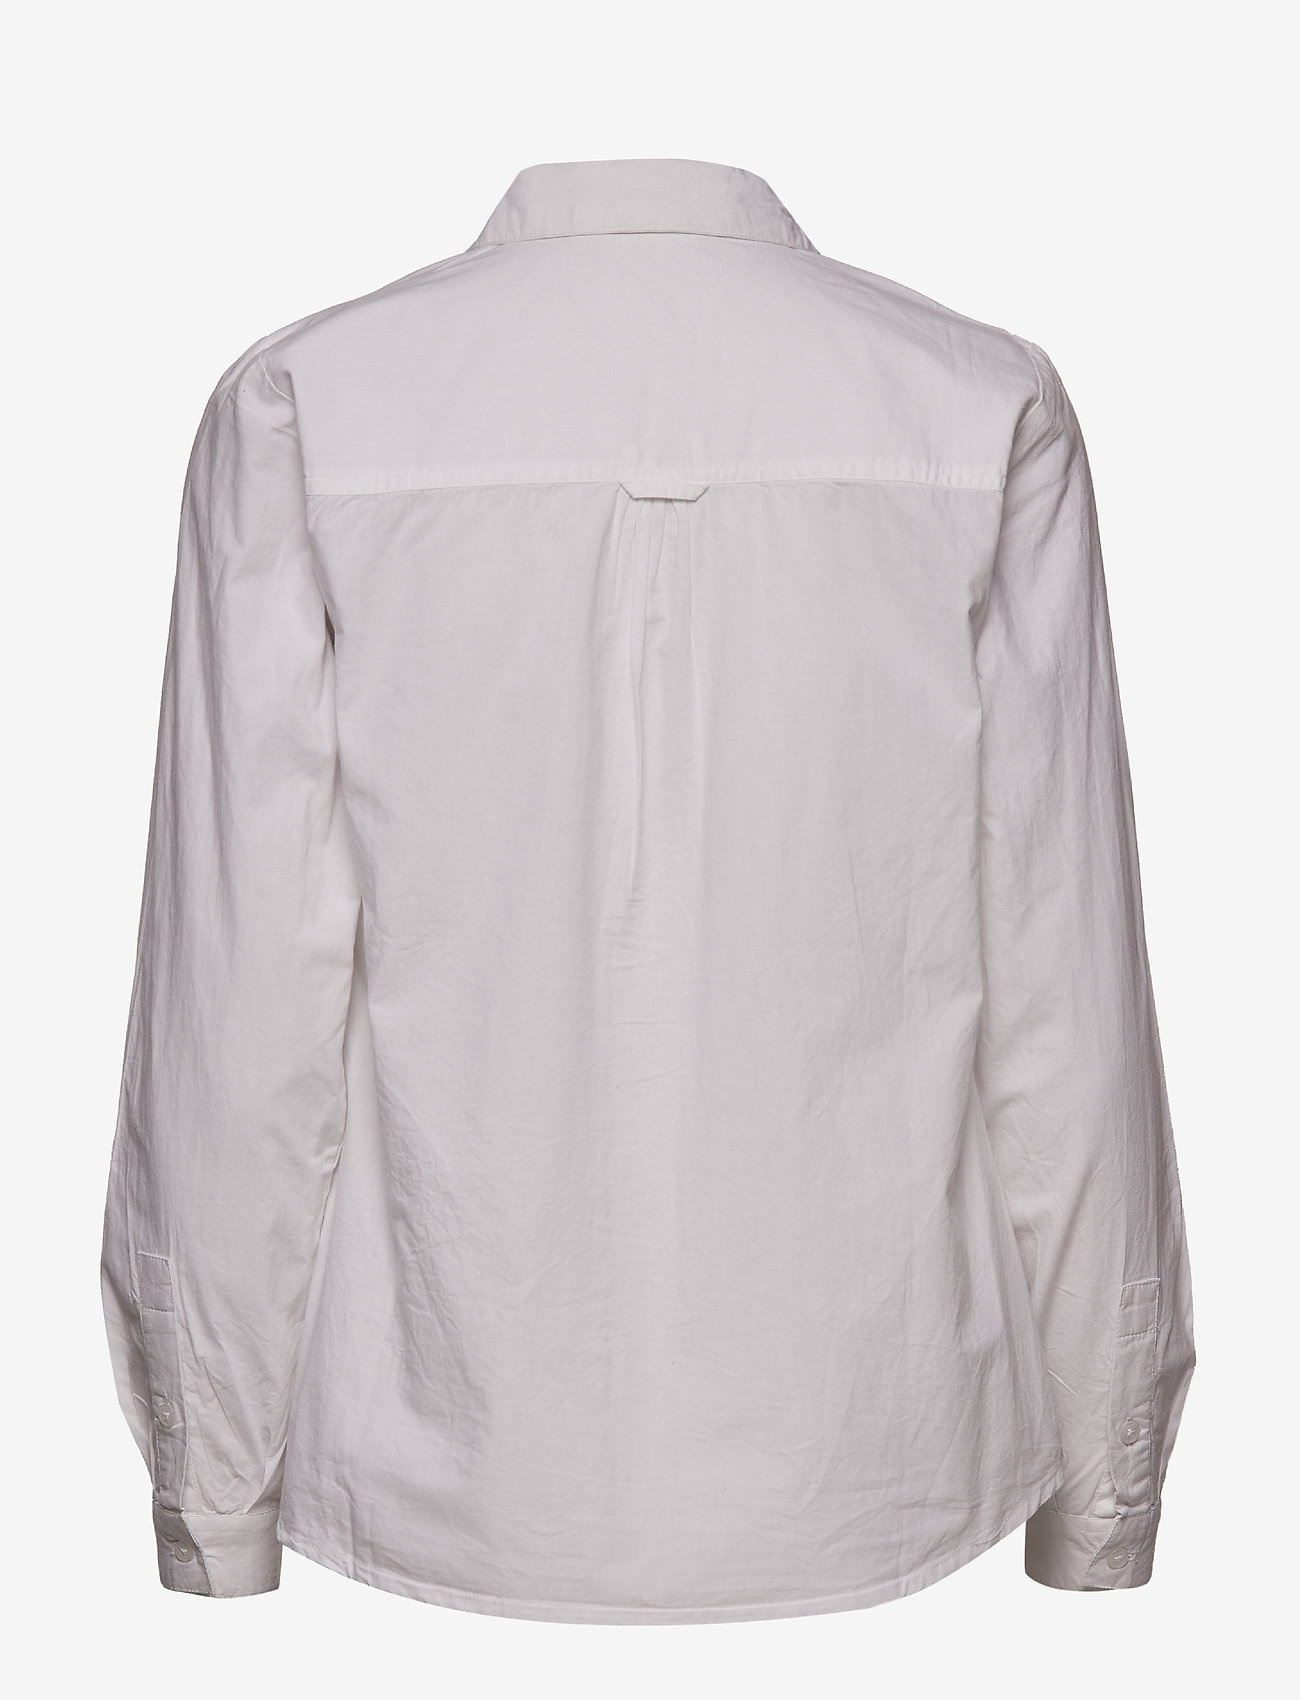 Pearly Shirt (Optical White) - Kaffe FflksB